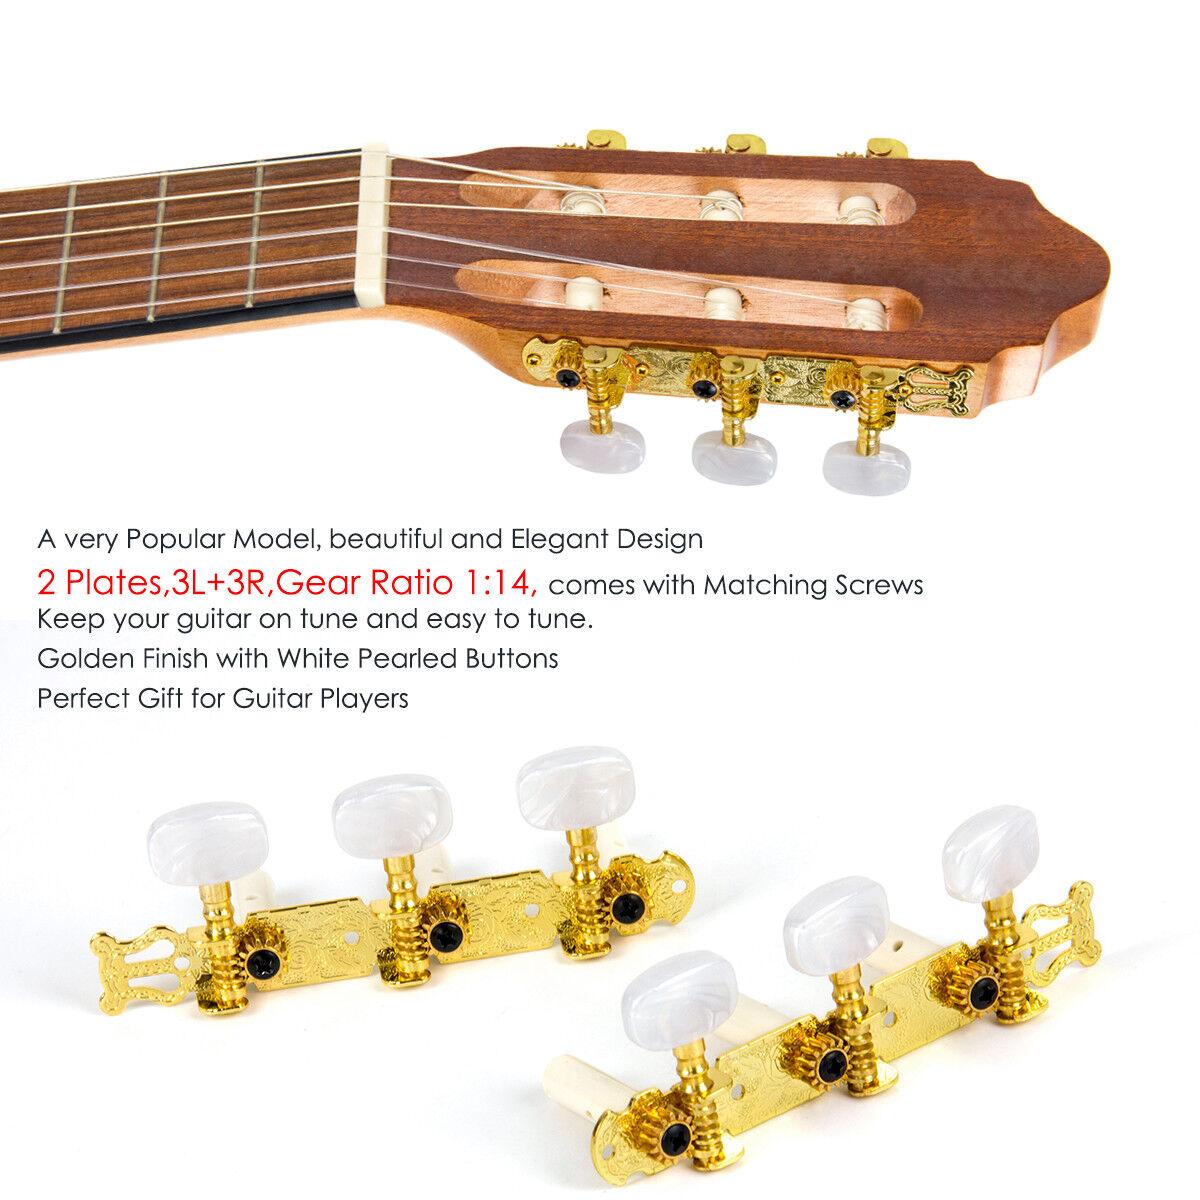 Swhmc Gold 4L4R Mandolin Guitar String Tuning Pegs Tuner Machine Heads Keys 8 Strings/Buttons